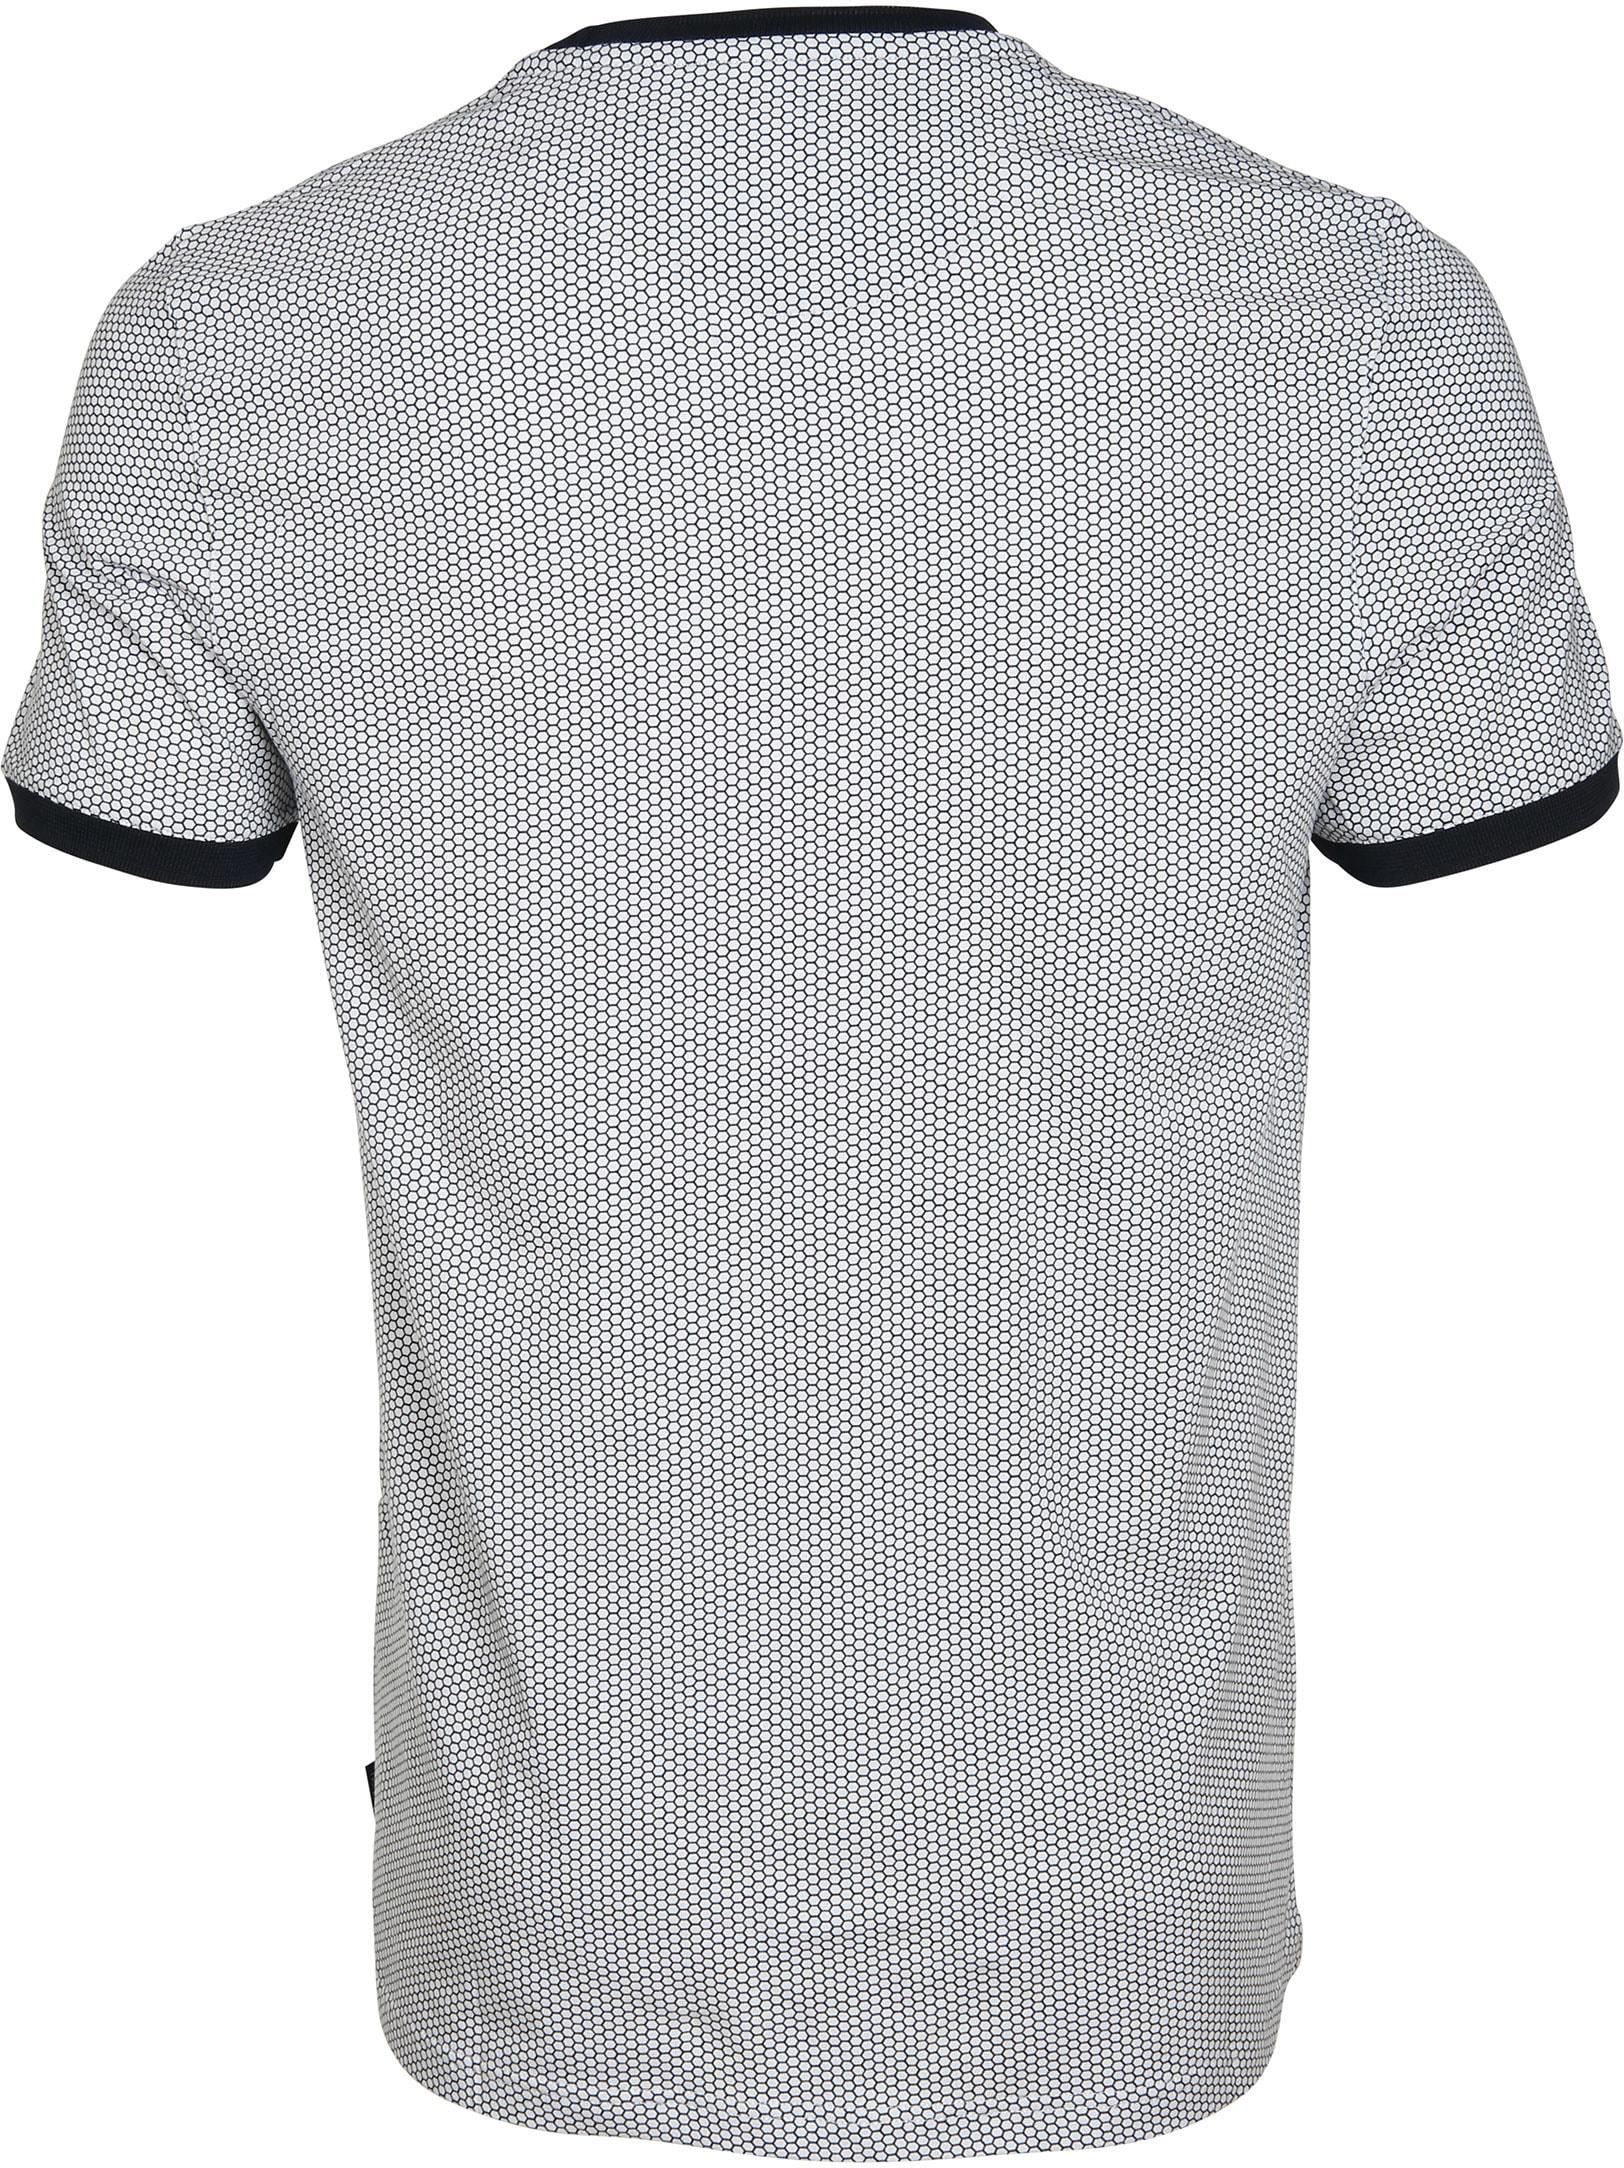 Ted Baker T-Shirt Honinggraat foto 2